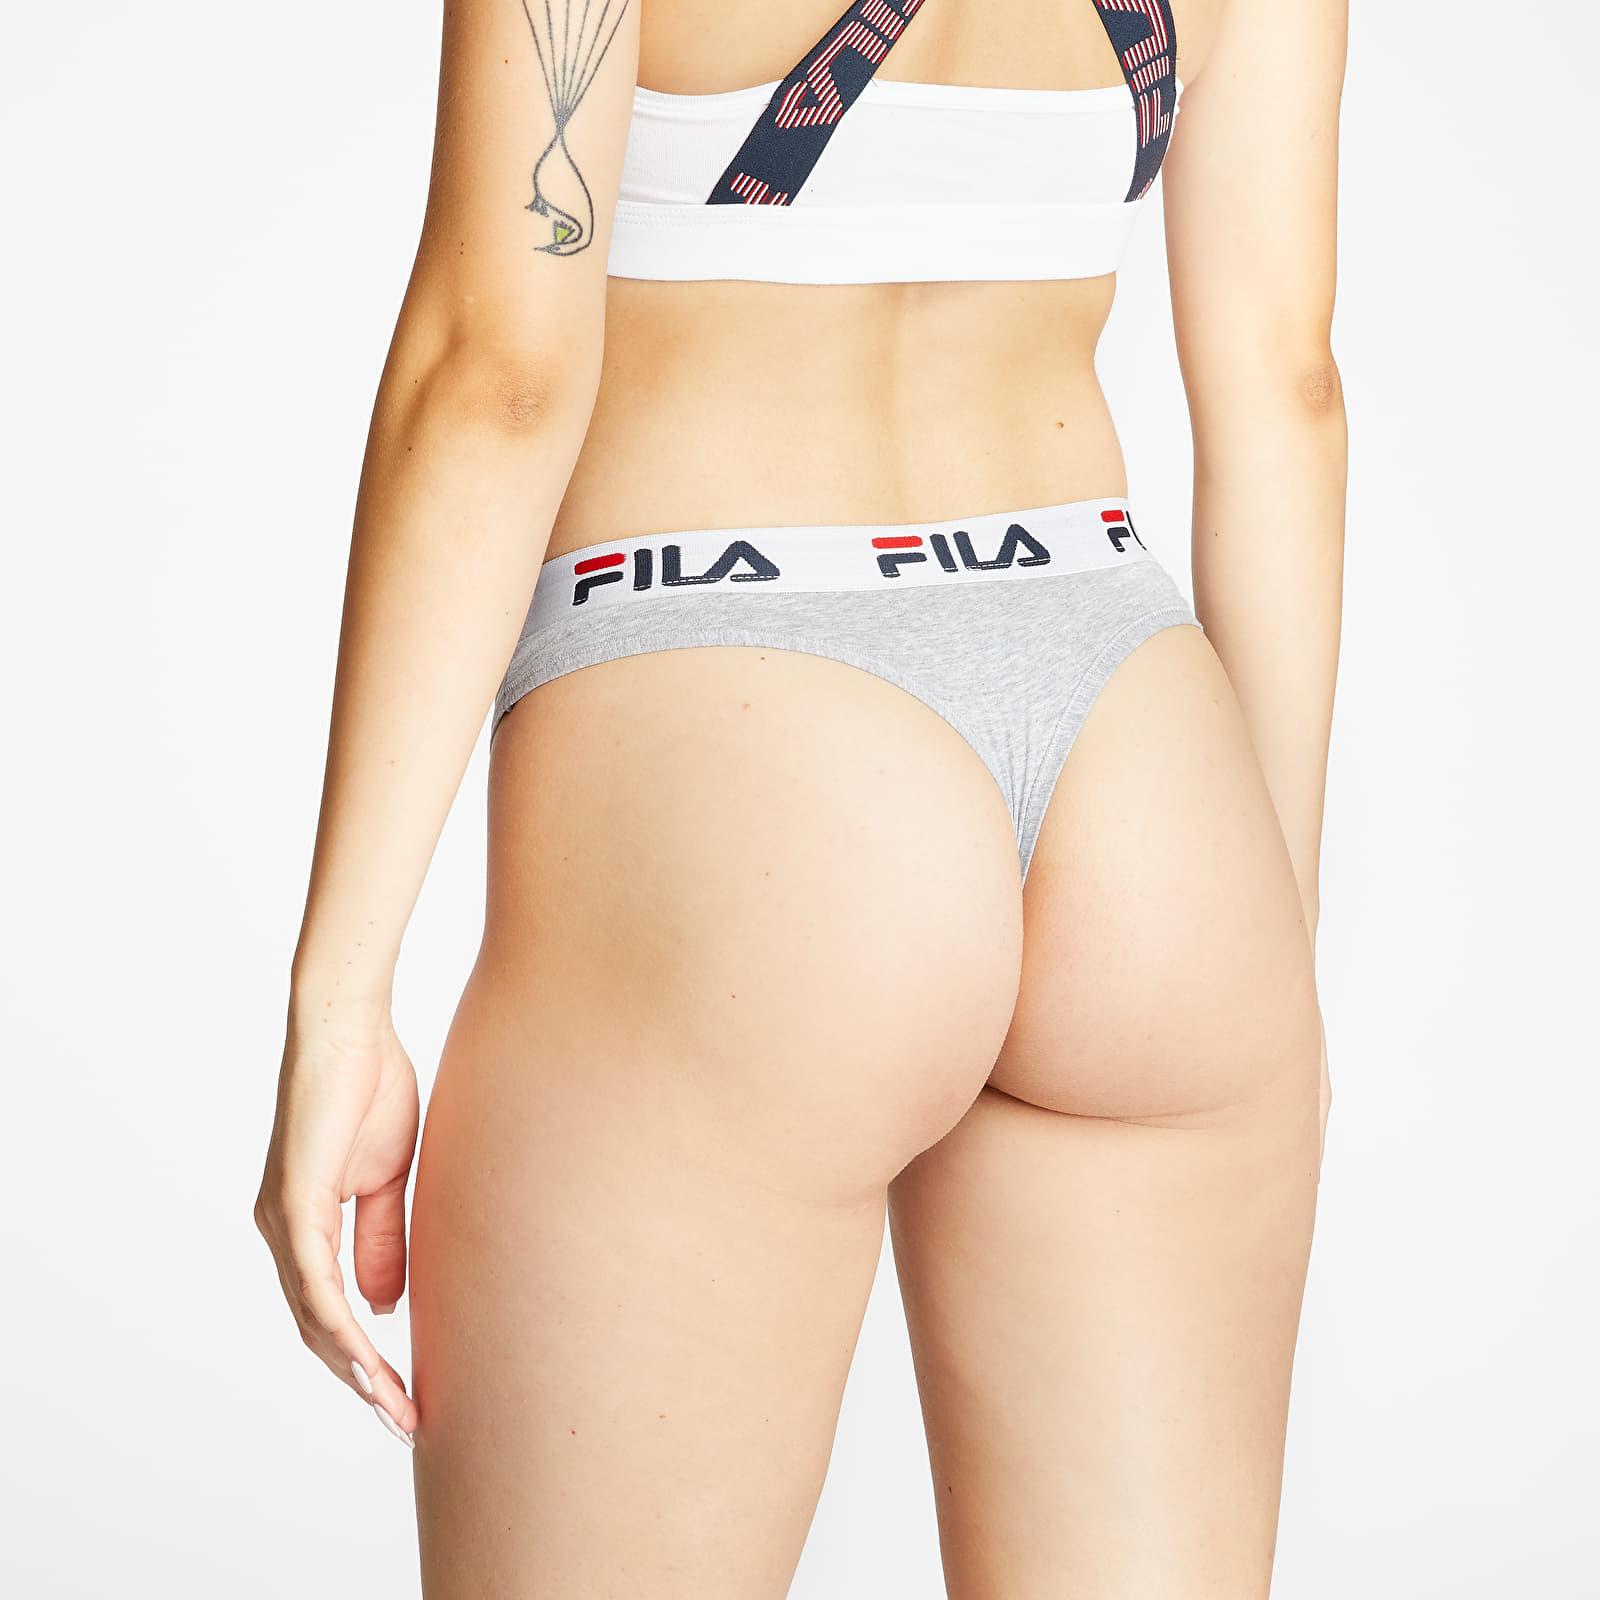 FILA String Grey, Gray